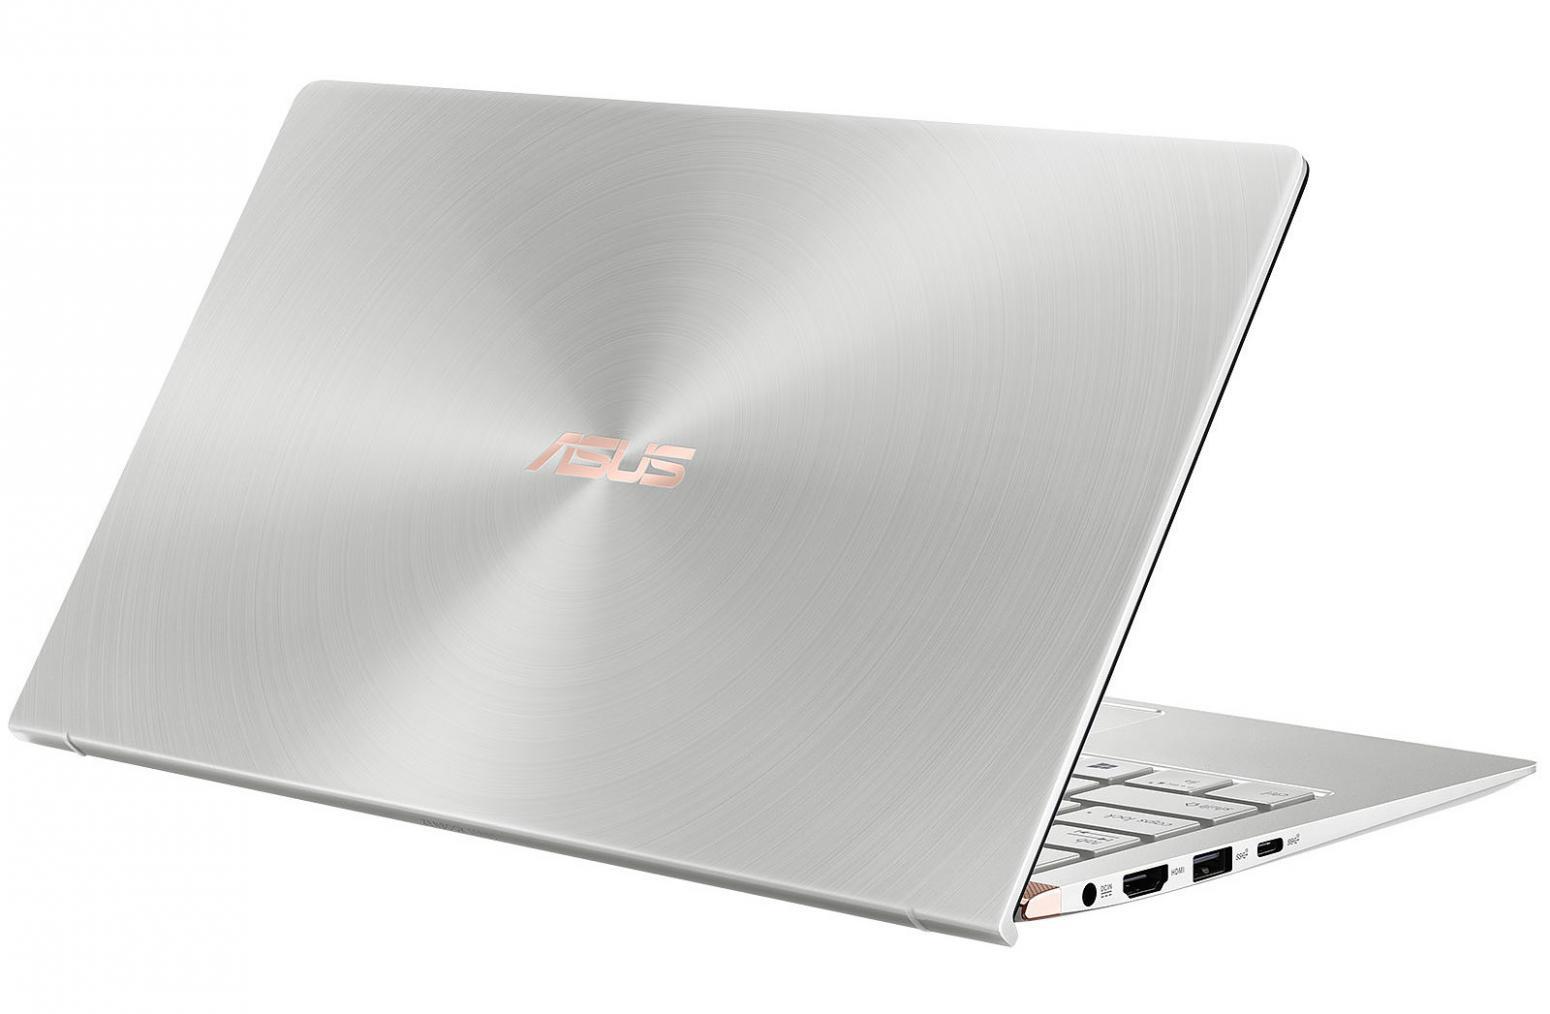 Ordinateur portable Asus Zenbook 13 UX333FA-A3112R Argent - NumPad, Pro - photo 4